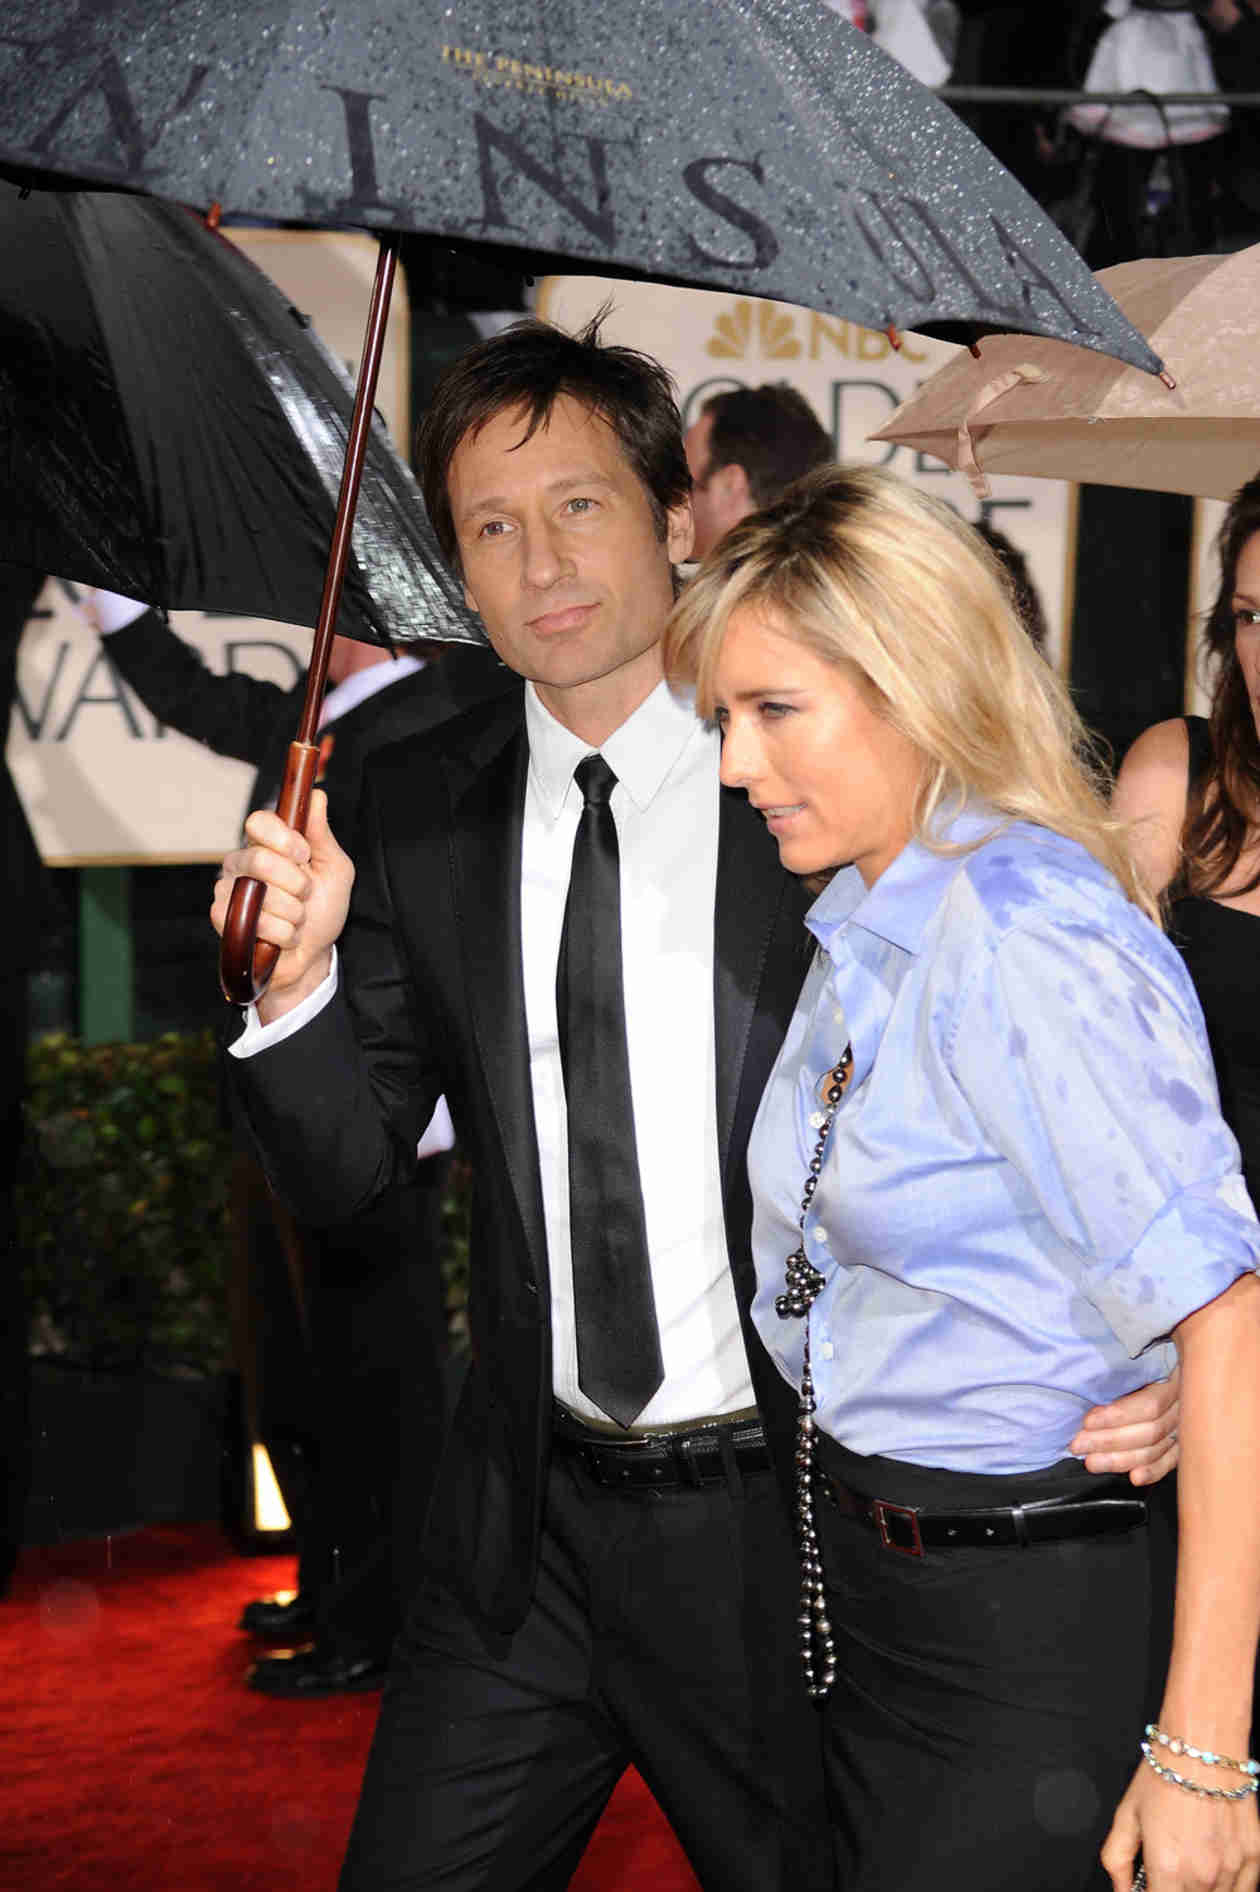 David Duchovny Divorces Tea Leoni — Three Years After Split